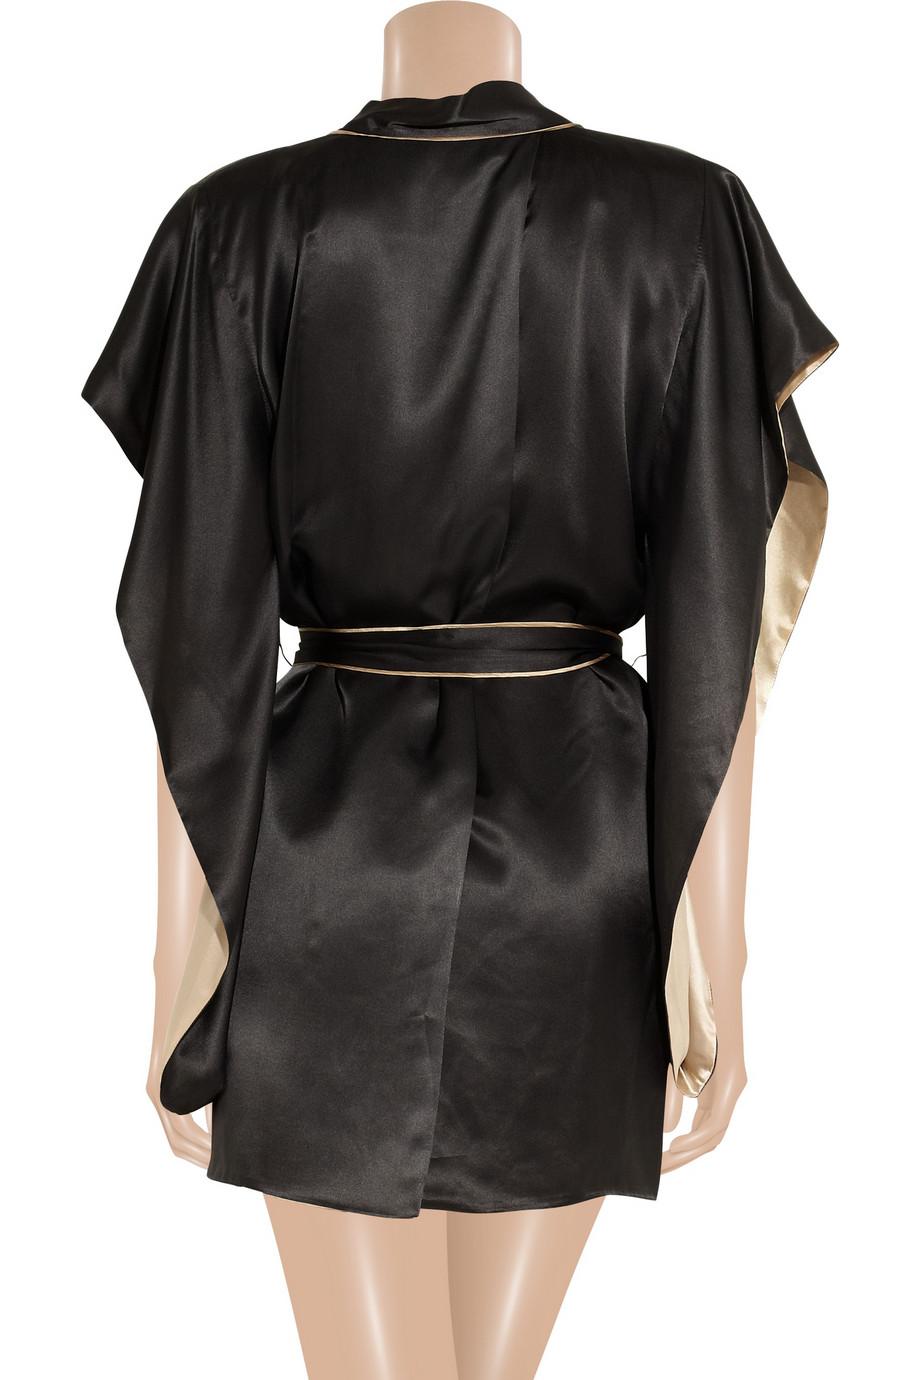 Ralph Lauren Kimono Robe